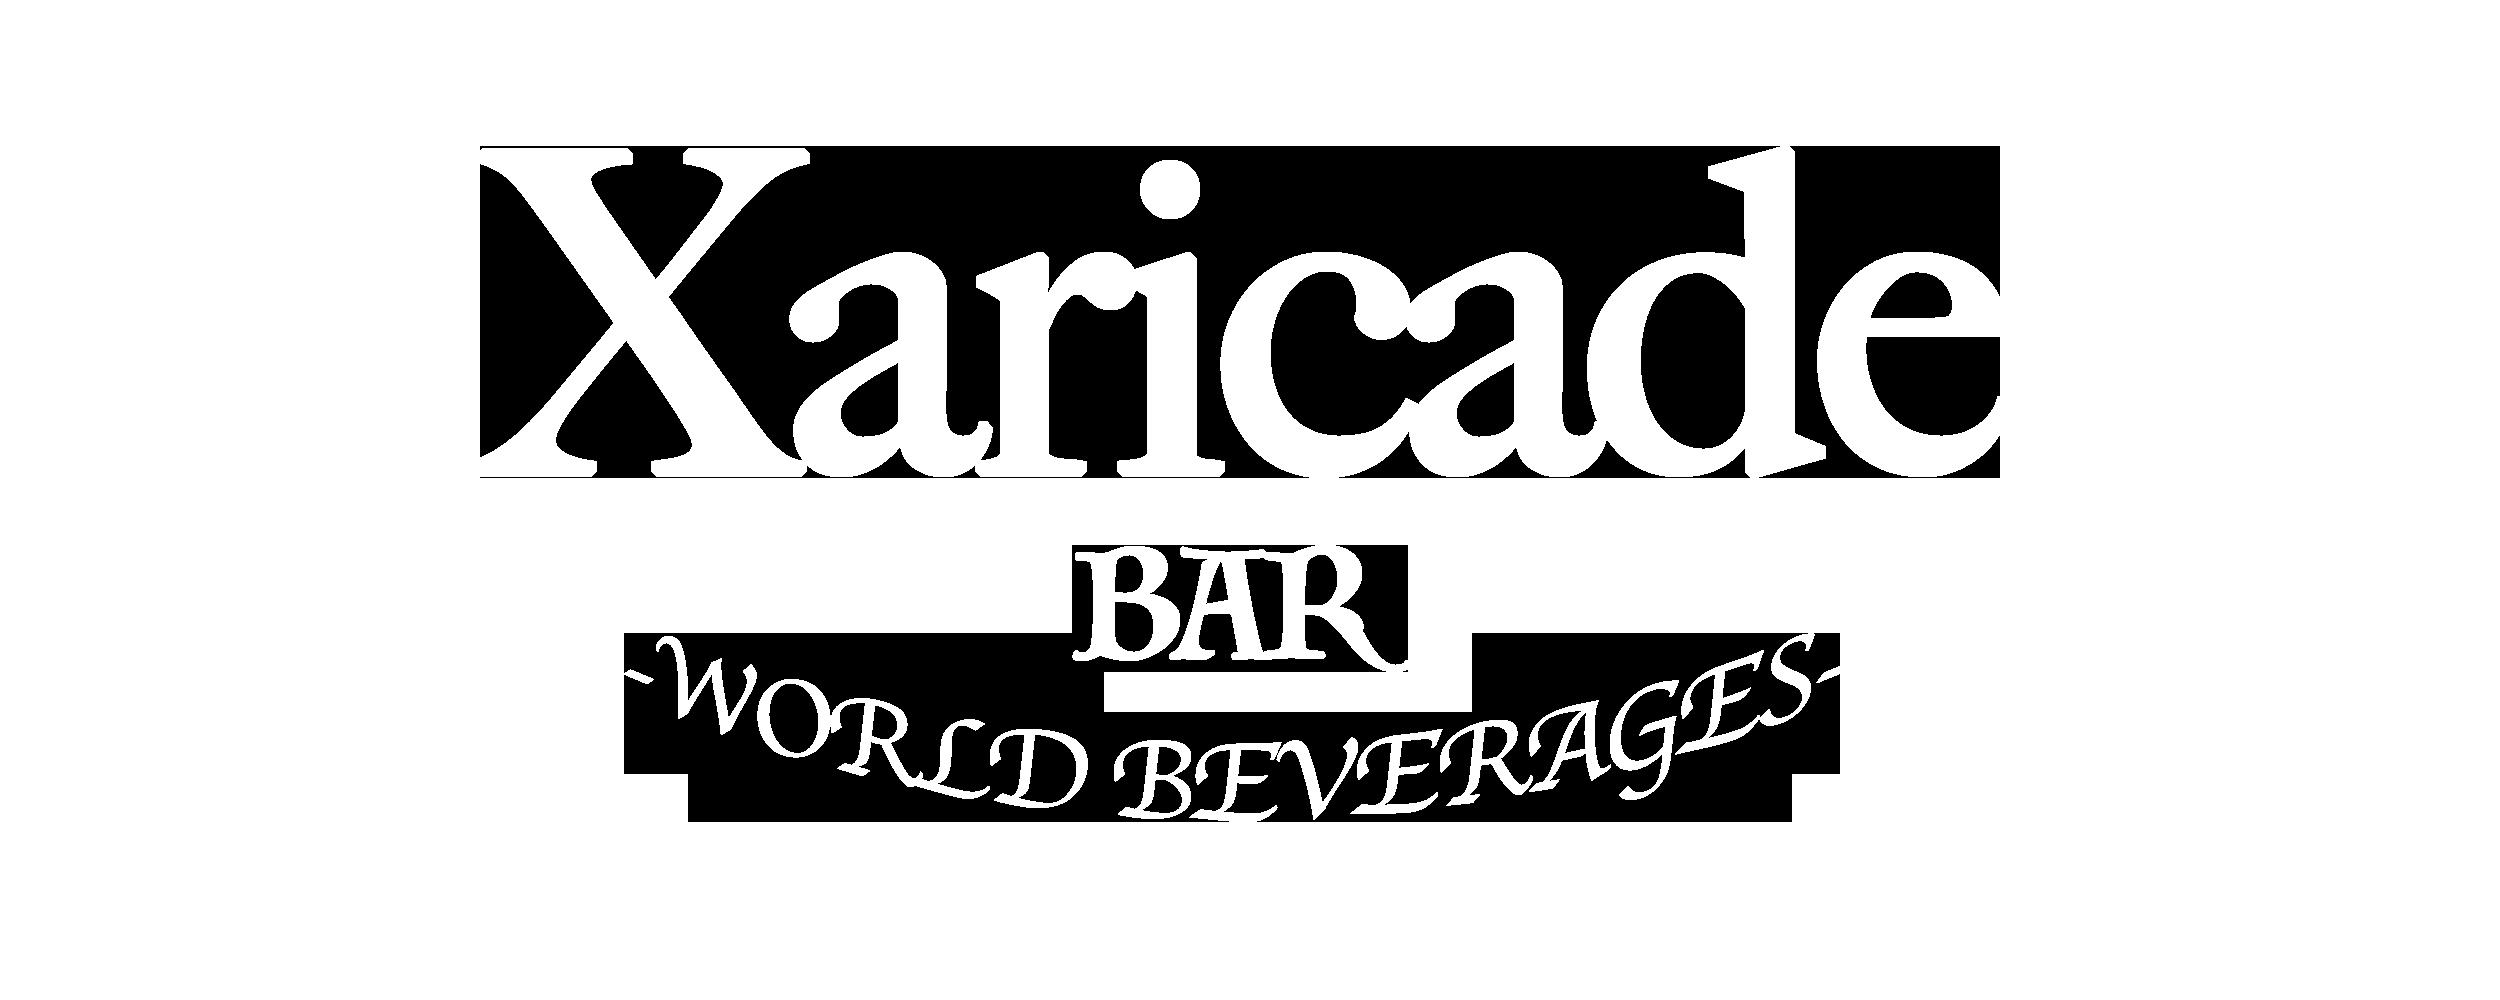 Xaricade-世界のお酒が飲めるBAR-